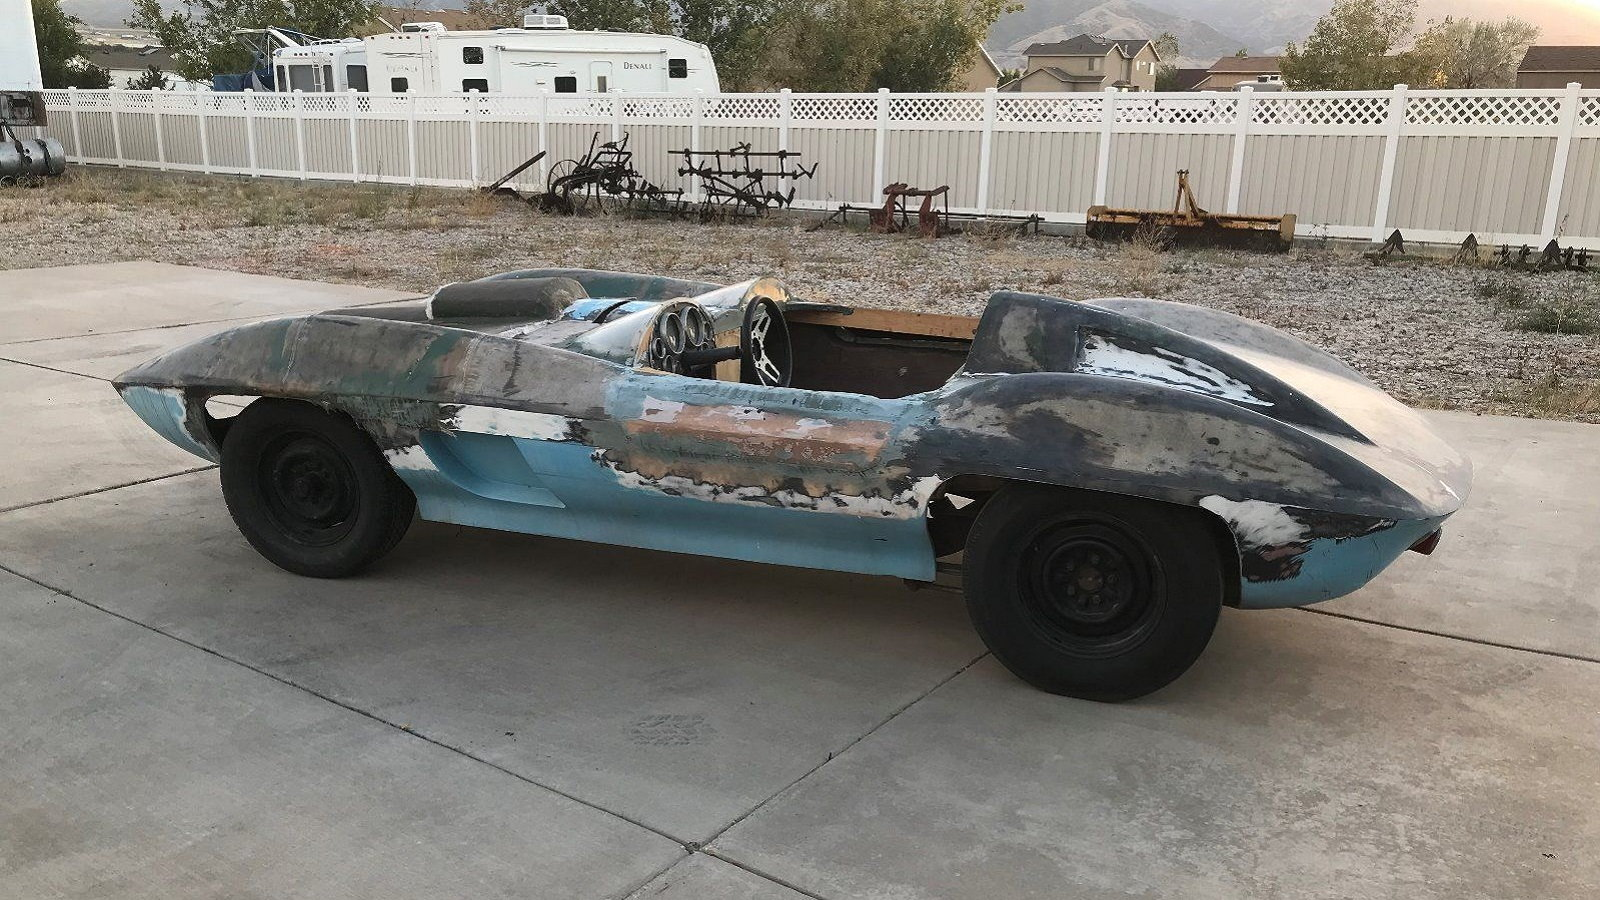 1959 Corvette XP-87 Stingray Racer Replica Is One Cool